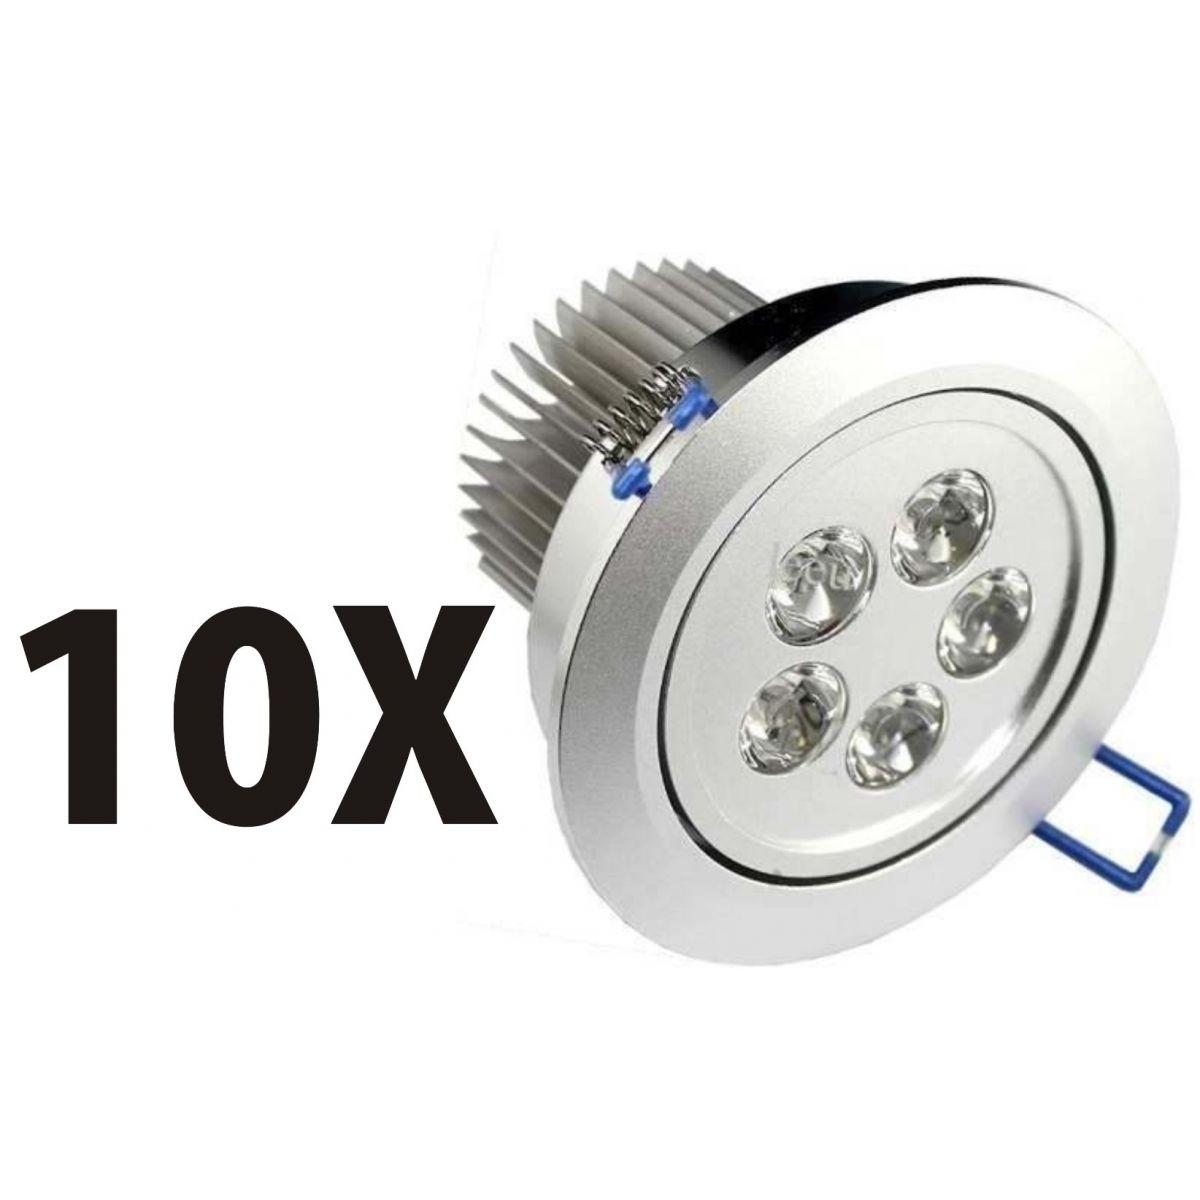 Kit 10 Spot Super Led Direcionável 5w P/ Teto Sanca E Gesso - ILIMITI SHOP